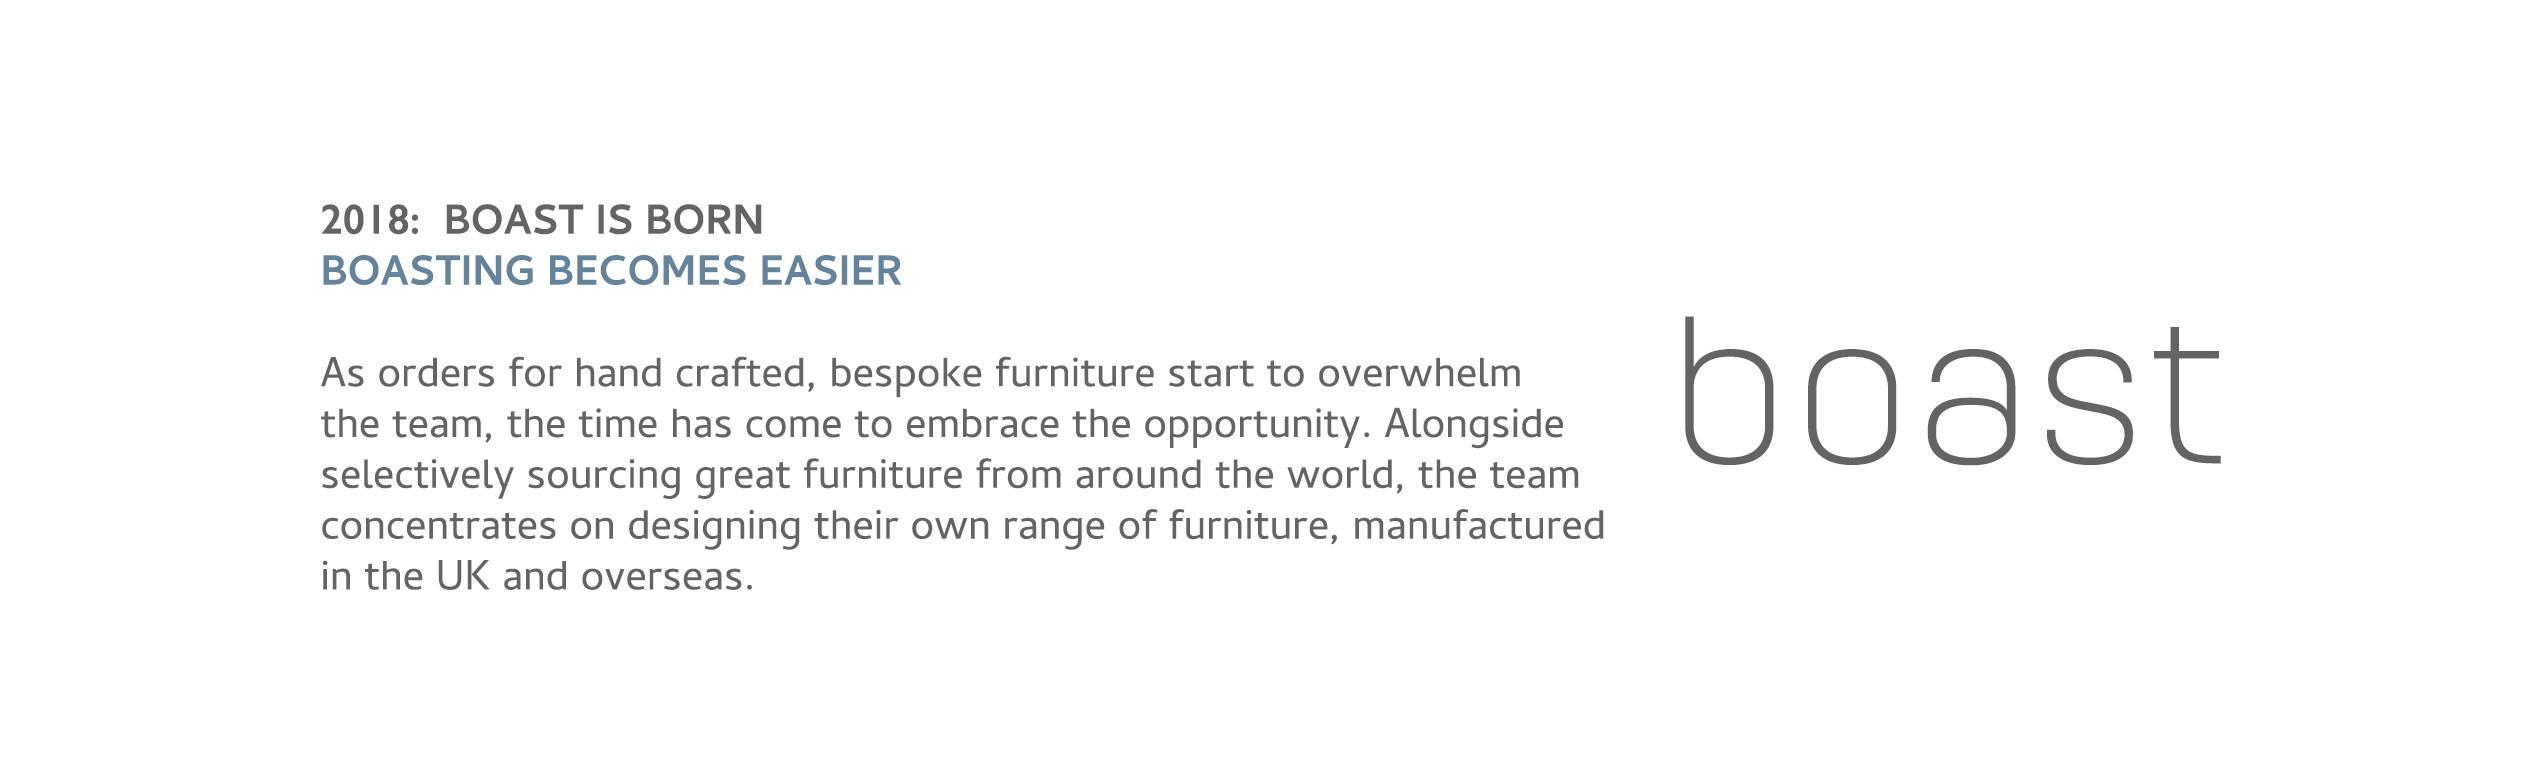 Boast Handcrafted Furniture